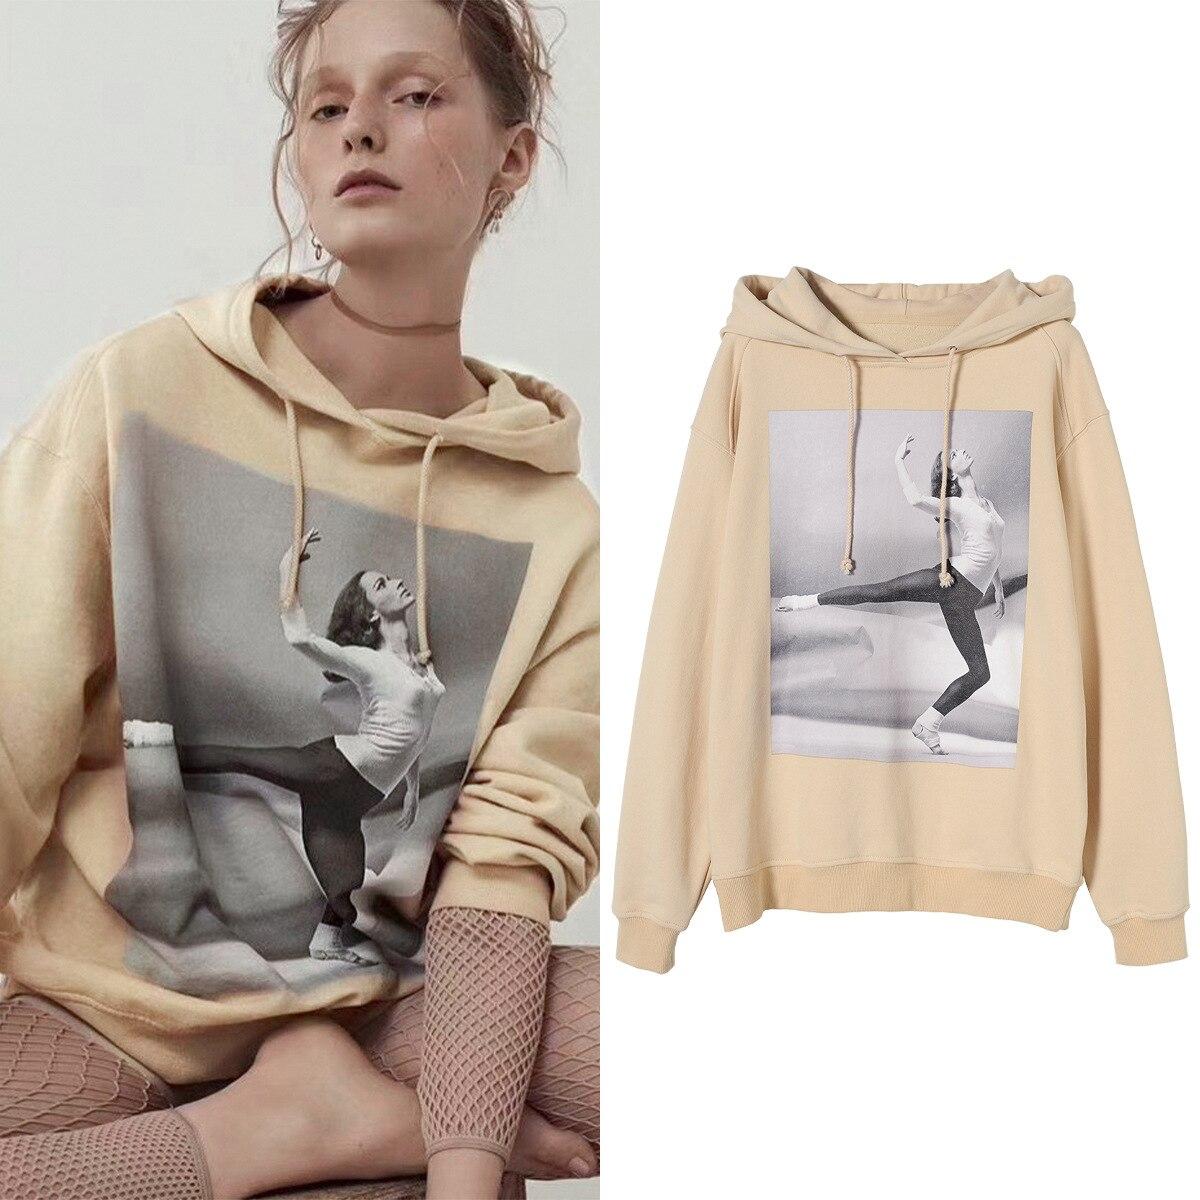 Spring Autumn Letter Print Dancer Oversize Loose Coat Hooded Sweatshirt Women's Long Sleeve Hoodie A3